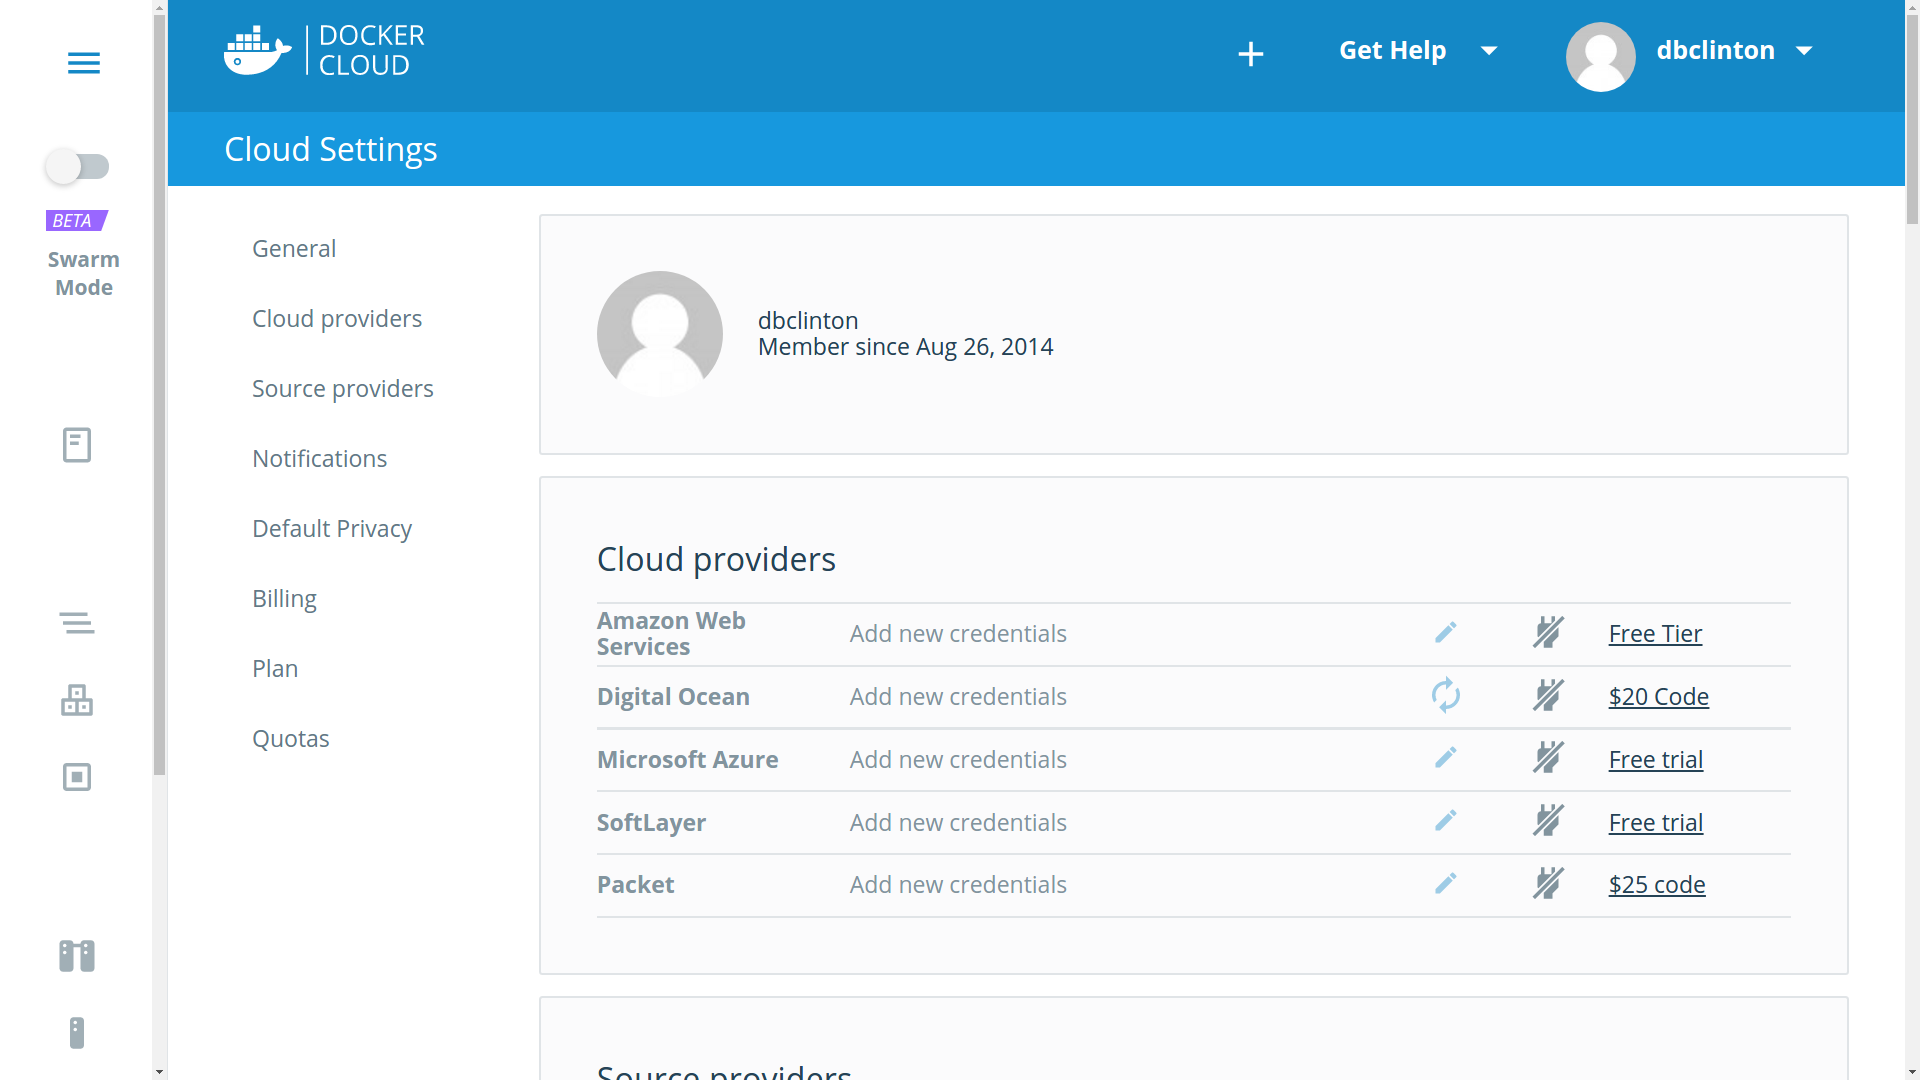 Docker Cloud settings